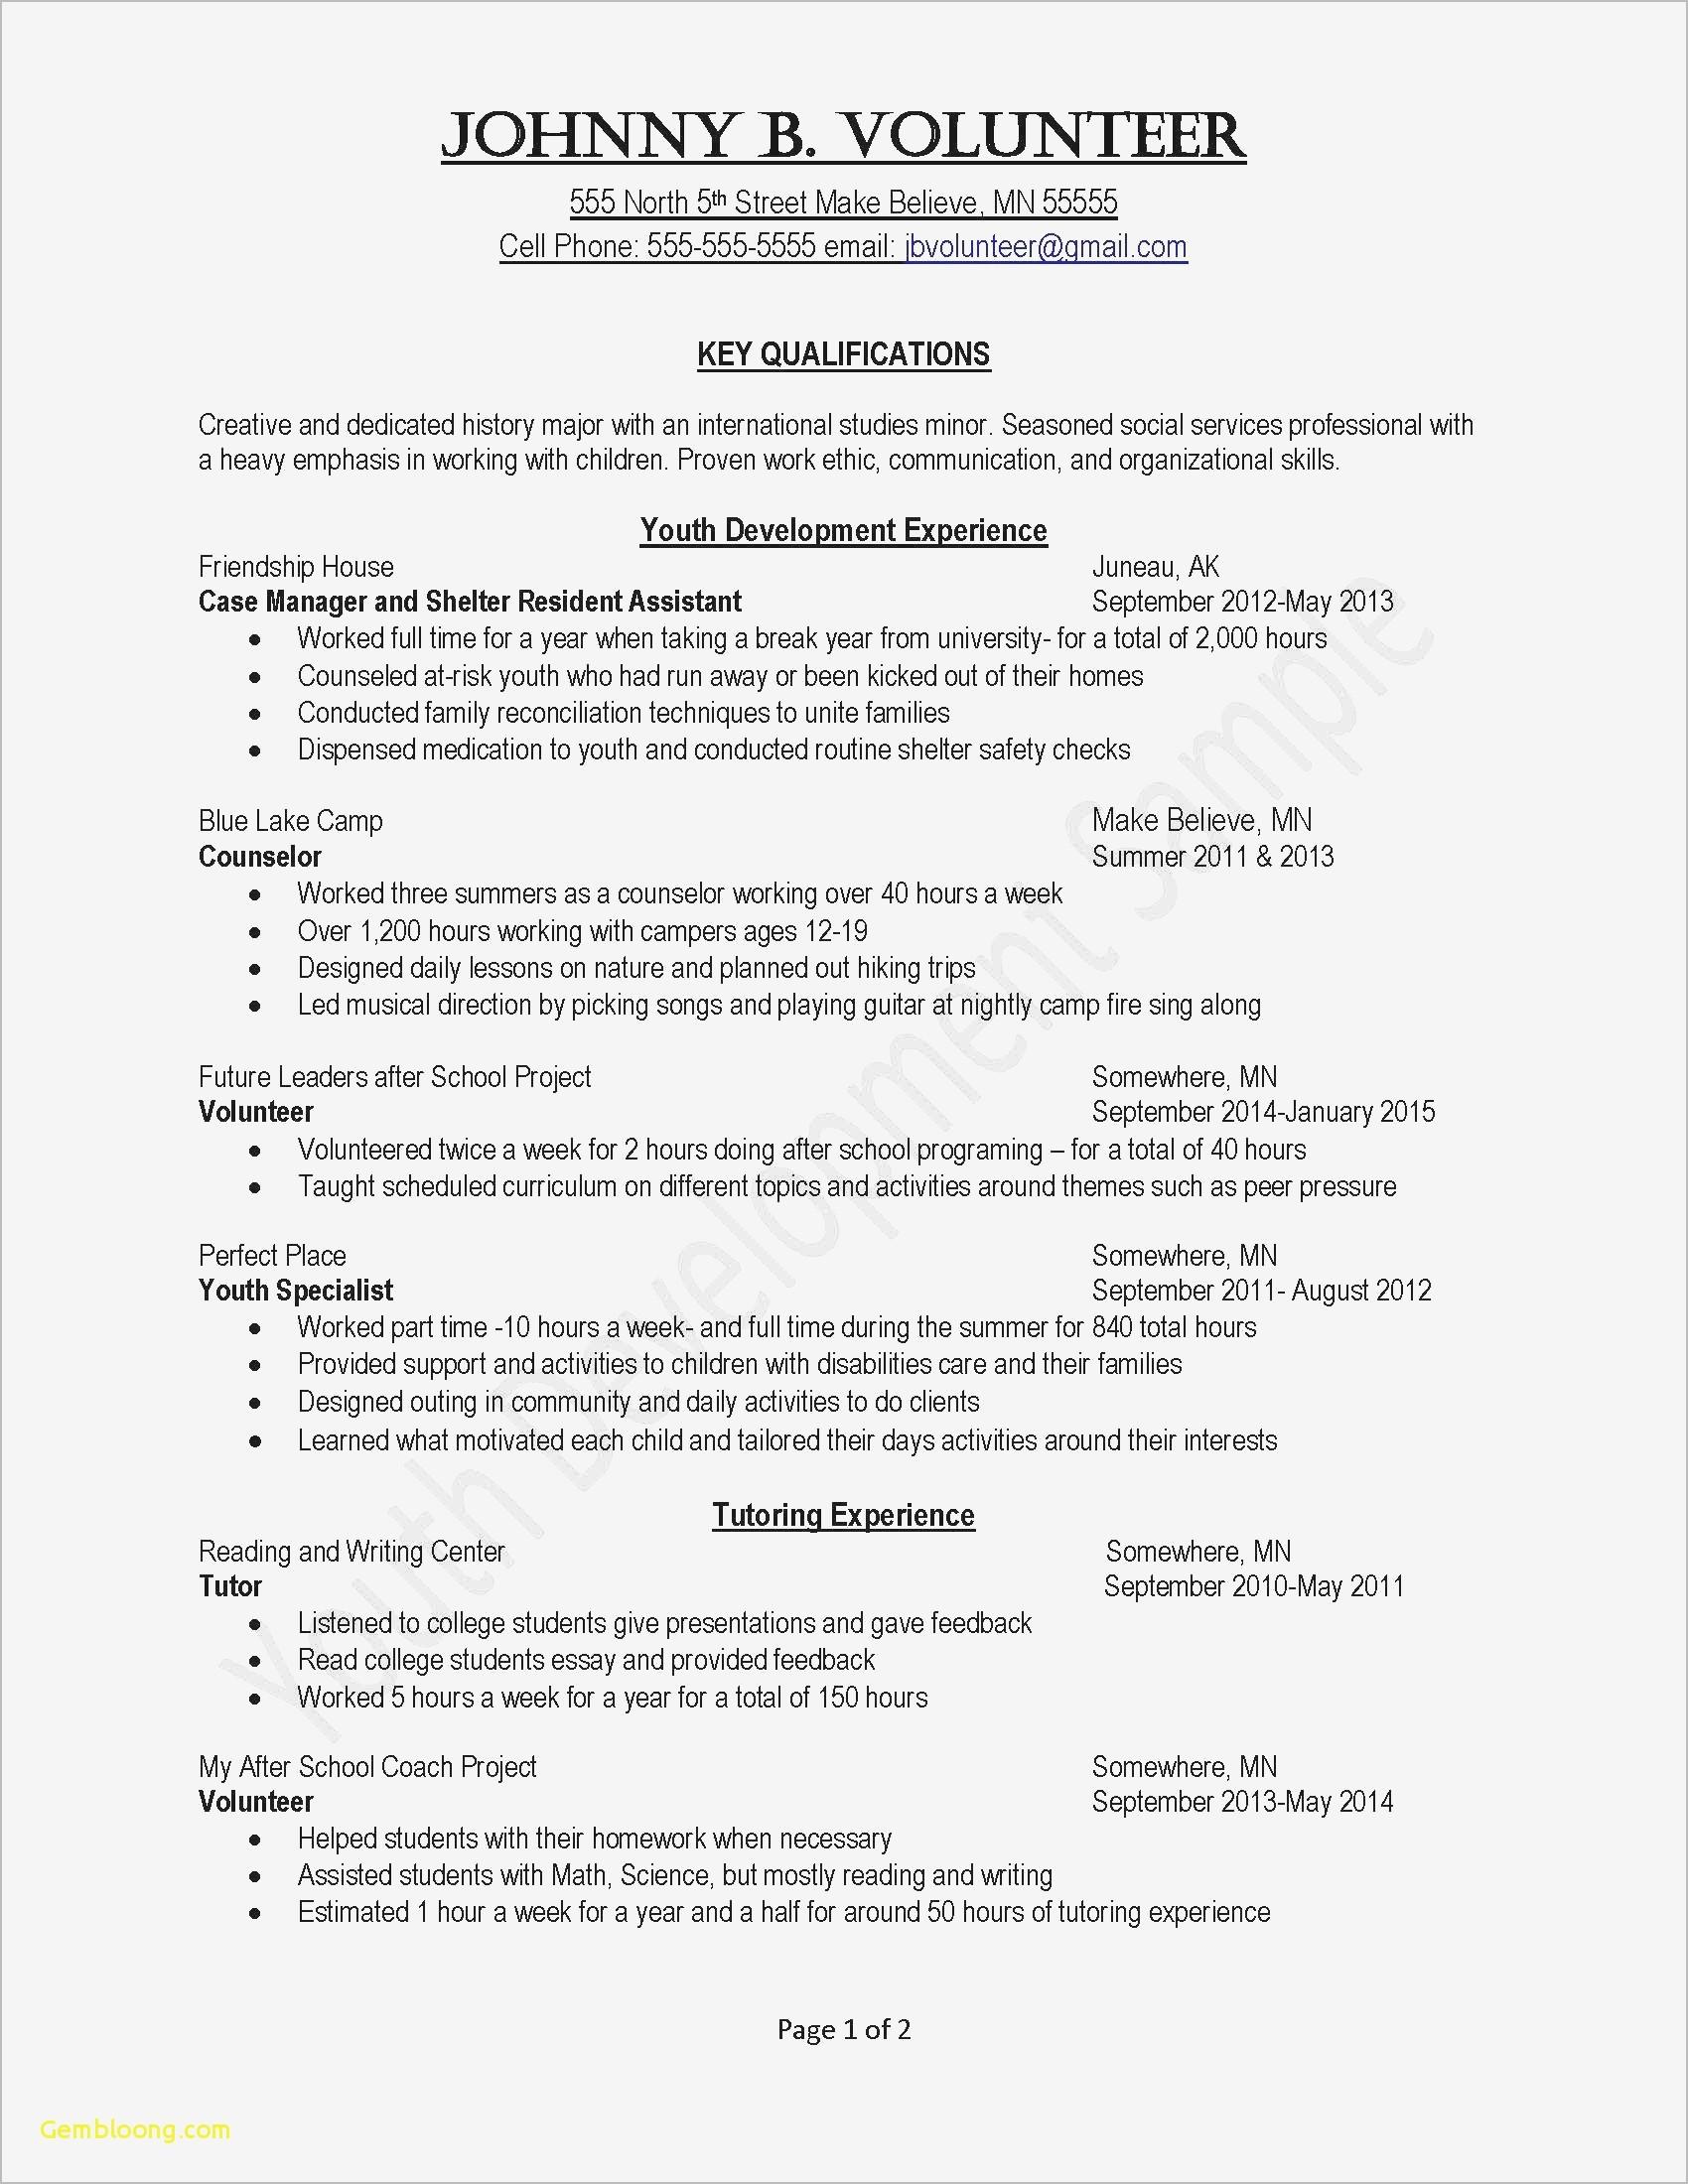 Work Offer Letter Template - Job Fer Letter Template Us Copy Od Consultant Cover Letter Fungram